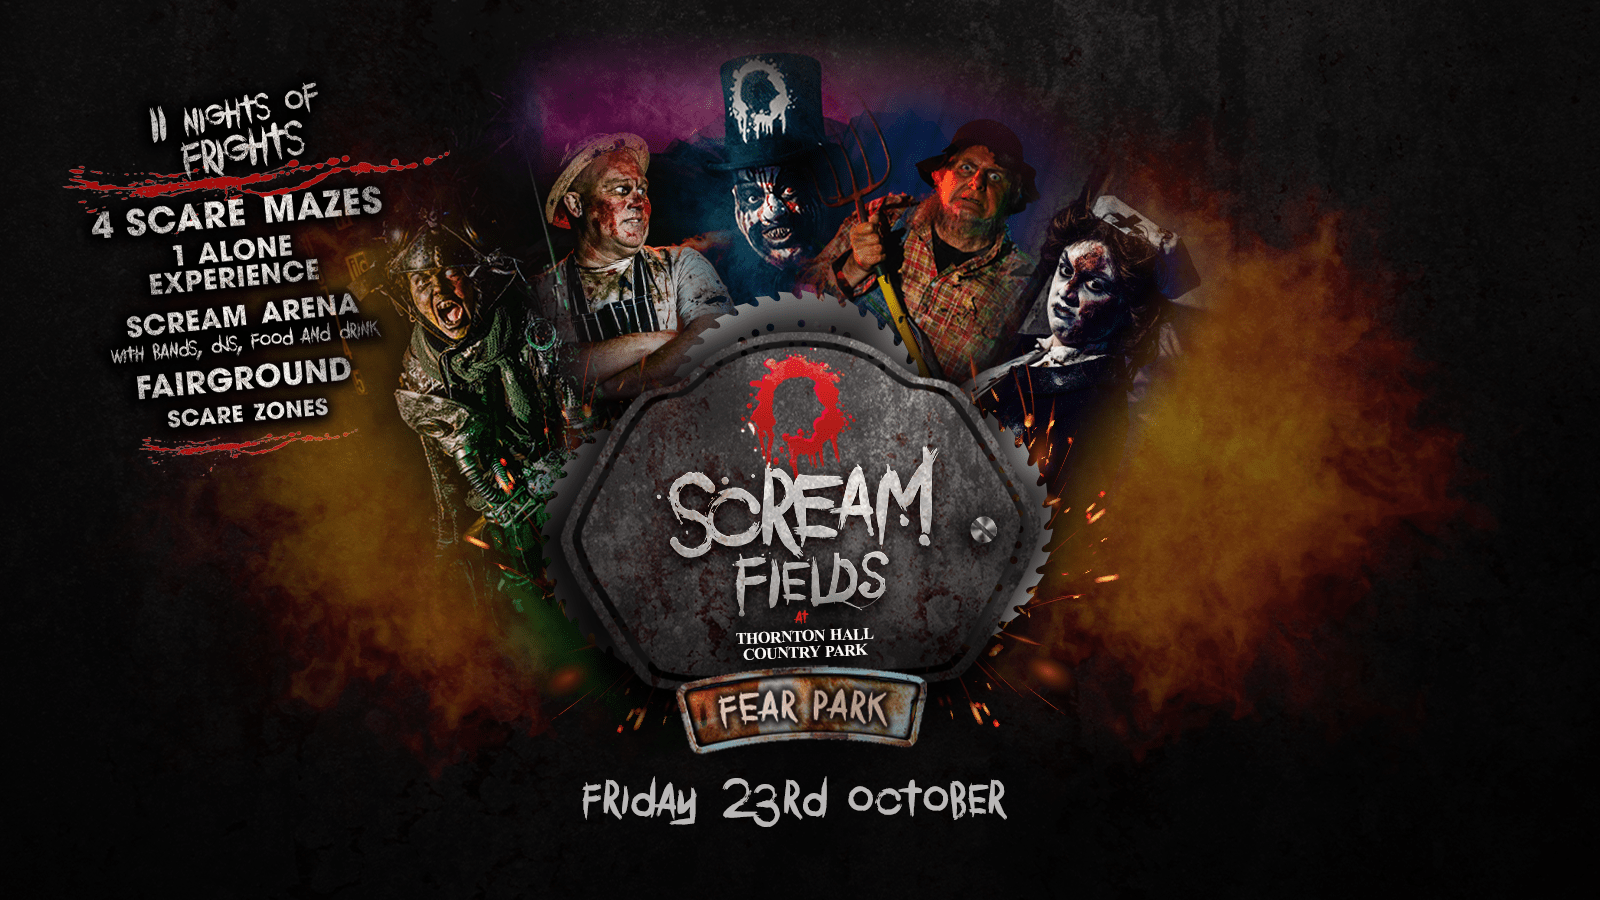 6.00PM – Screamfields: Friday 23rd October 2020